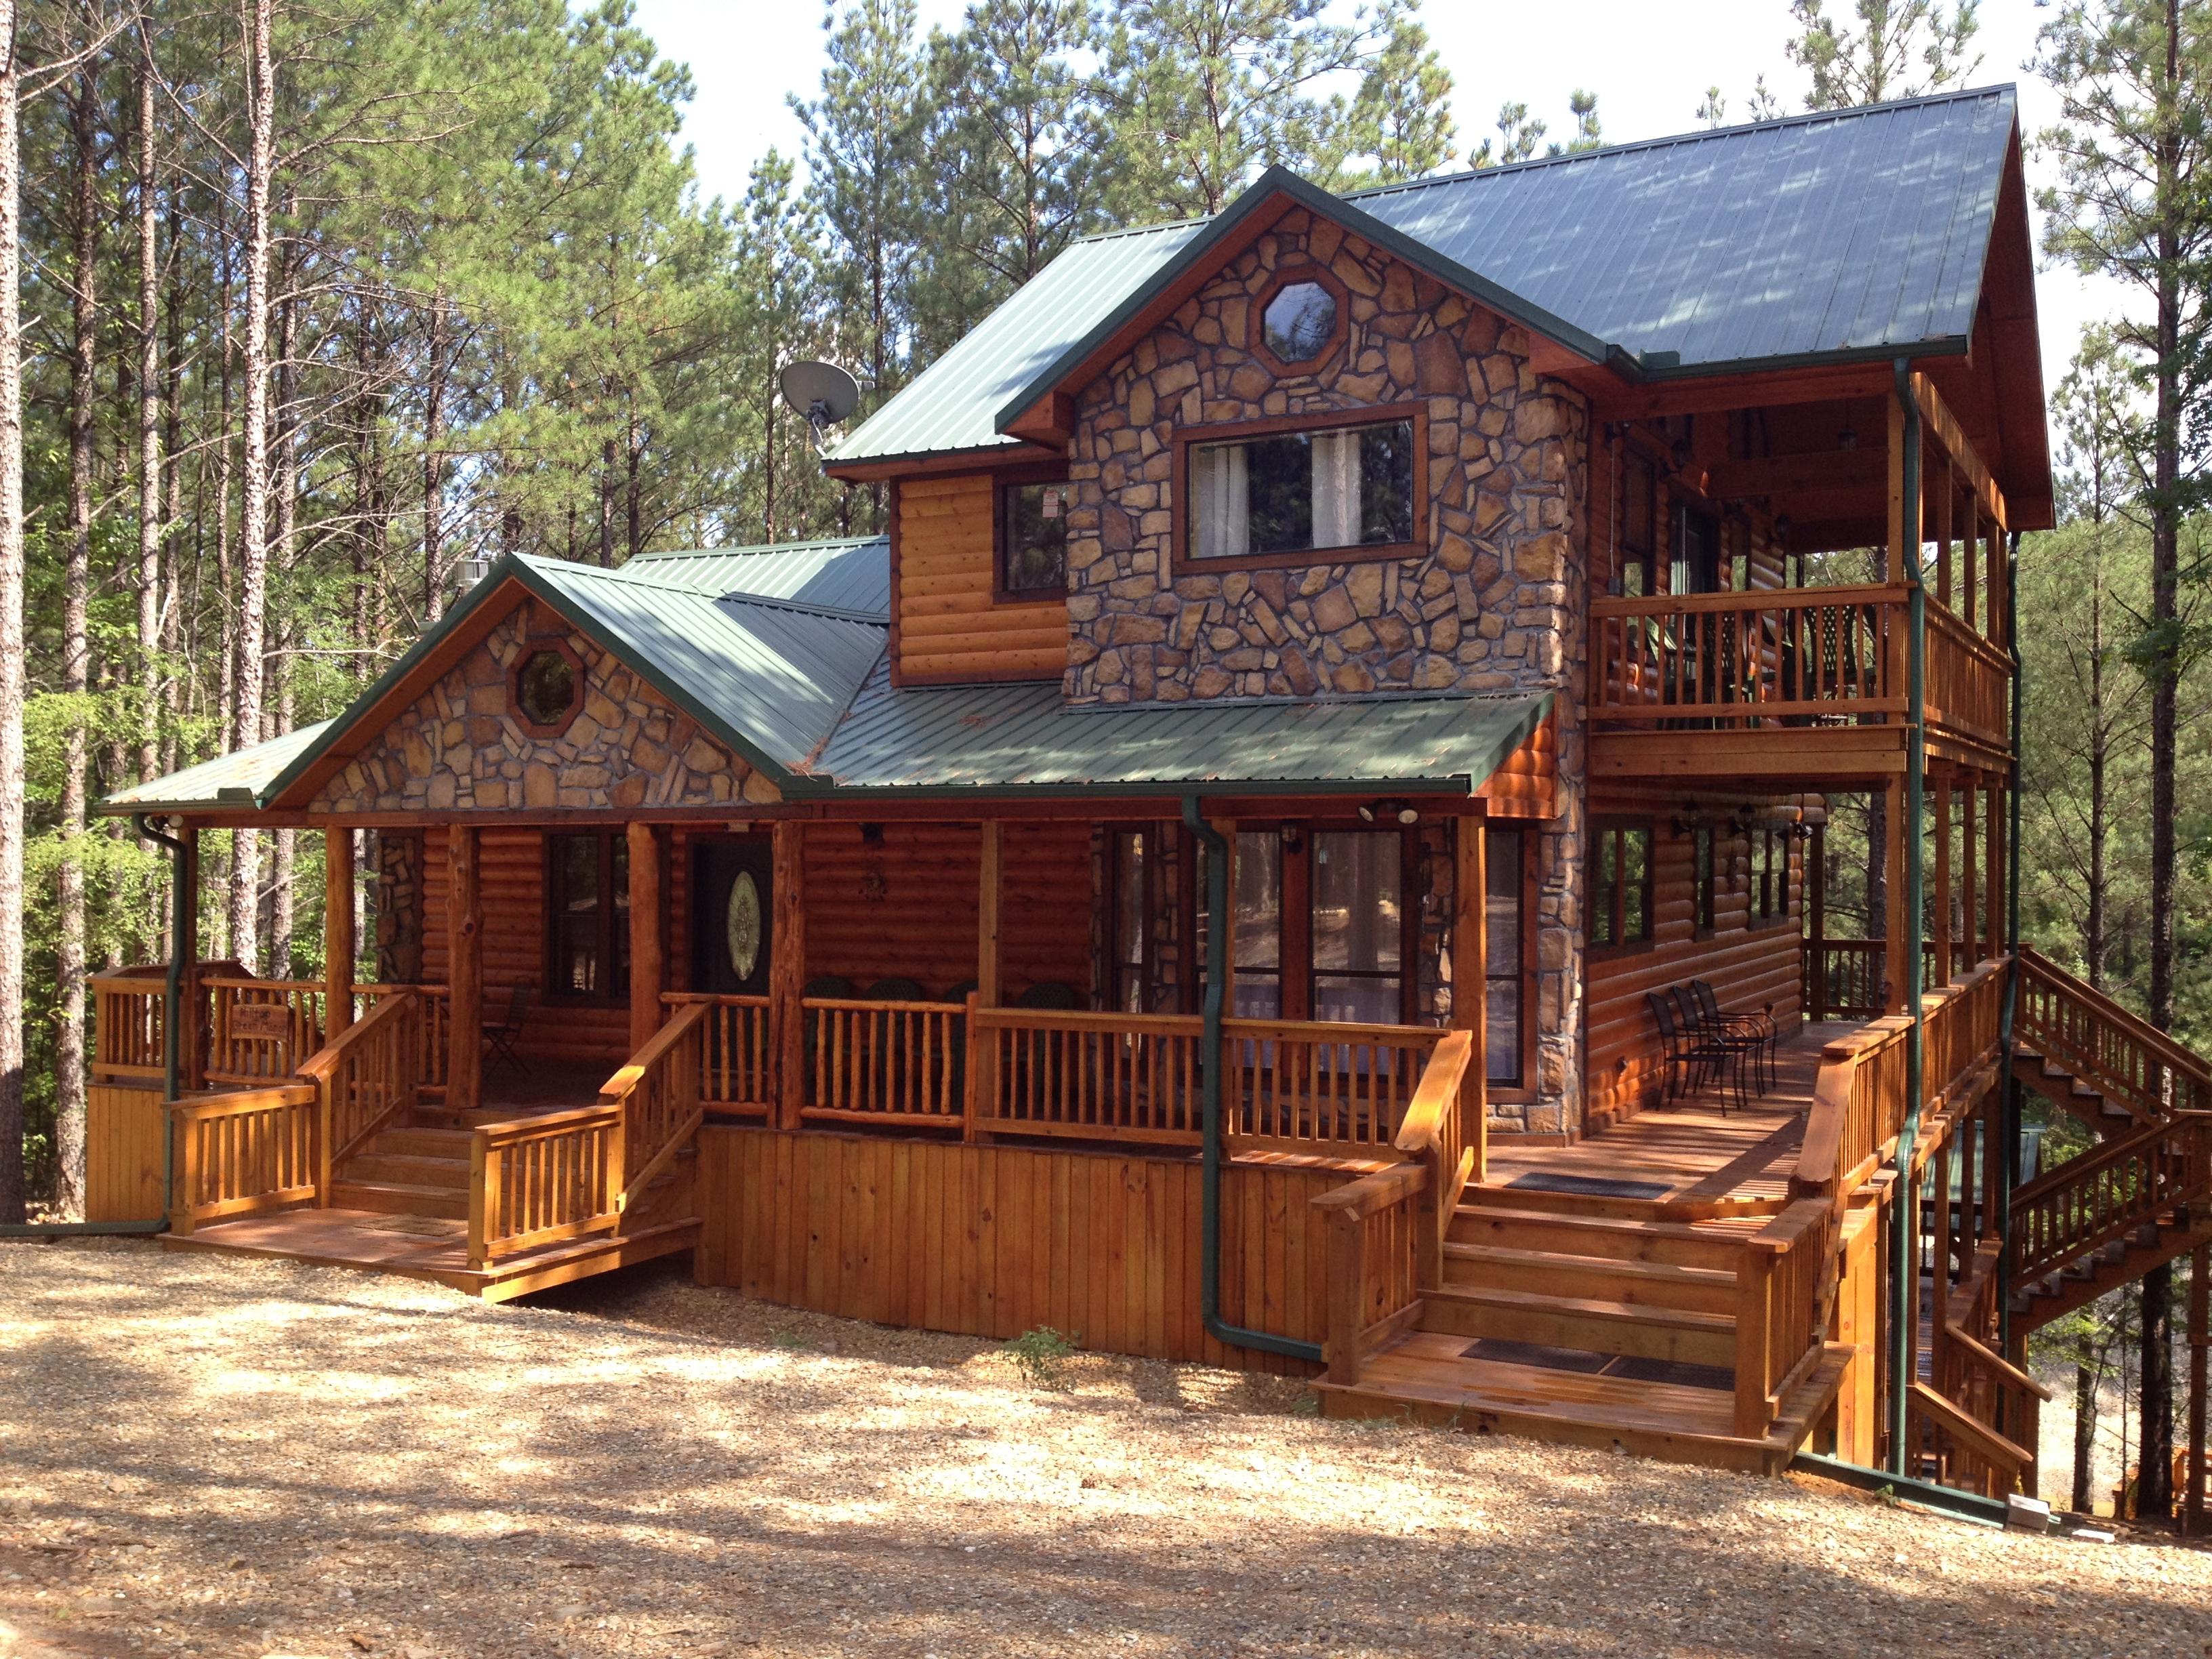 Lakefront cabin rentals in oklahoma hilltop green manor for Grand lake oklahoma cabin rentals